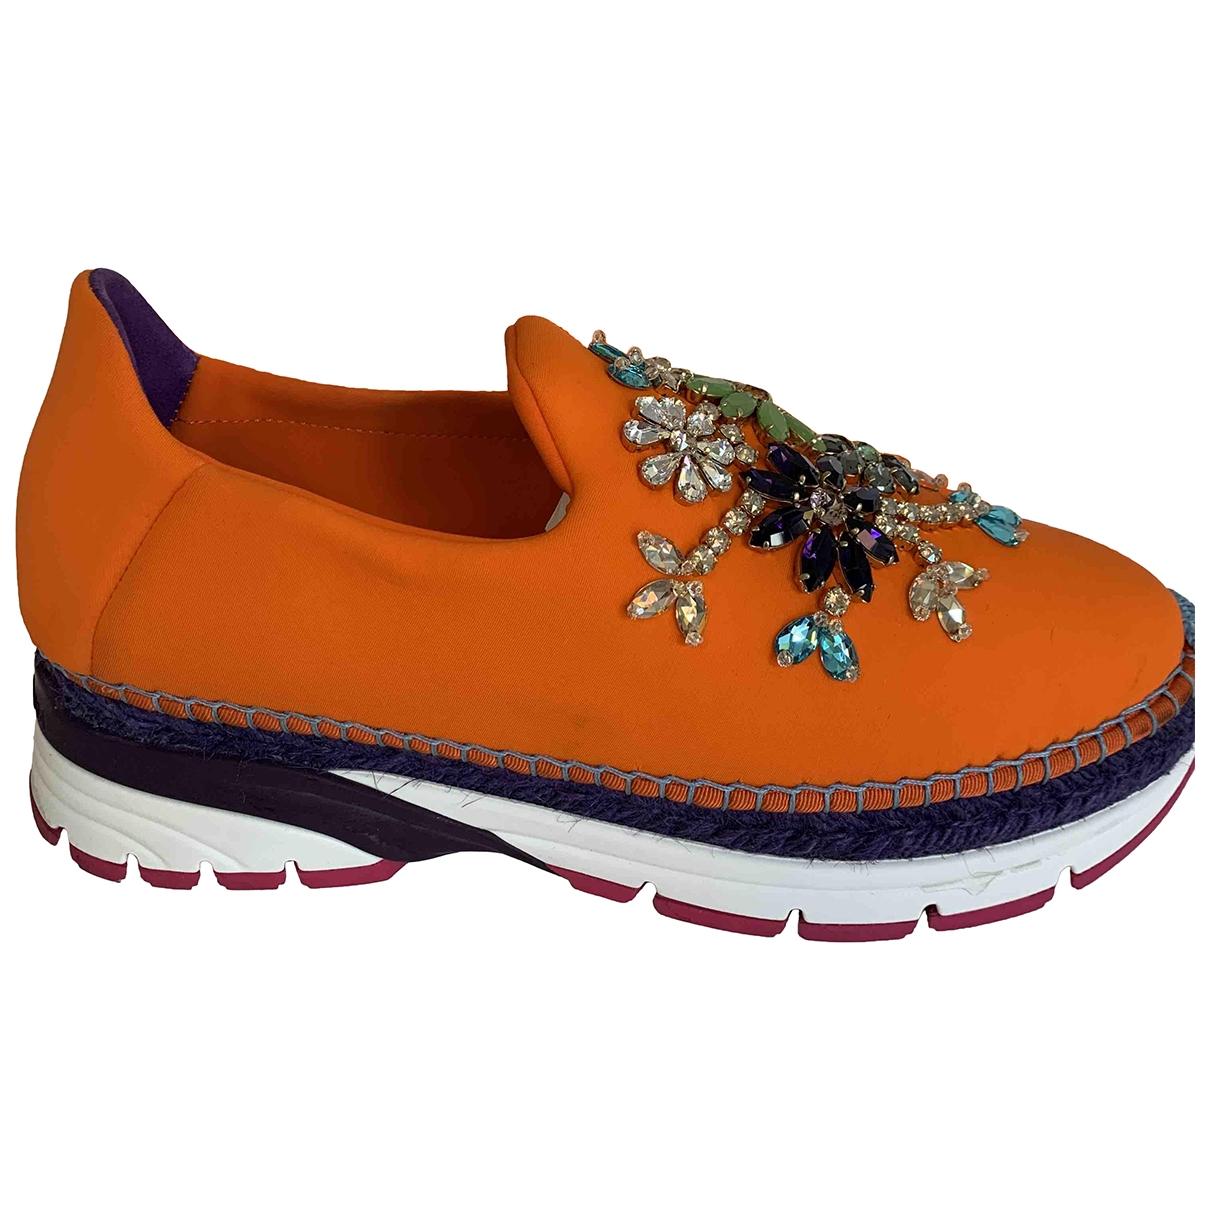 Dolce & Gabbana - Baskets   pour femme - orange